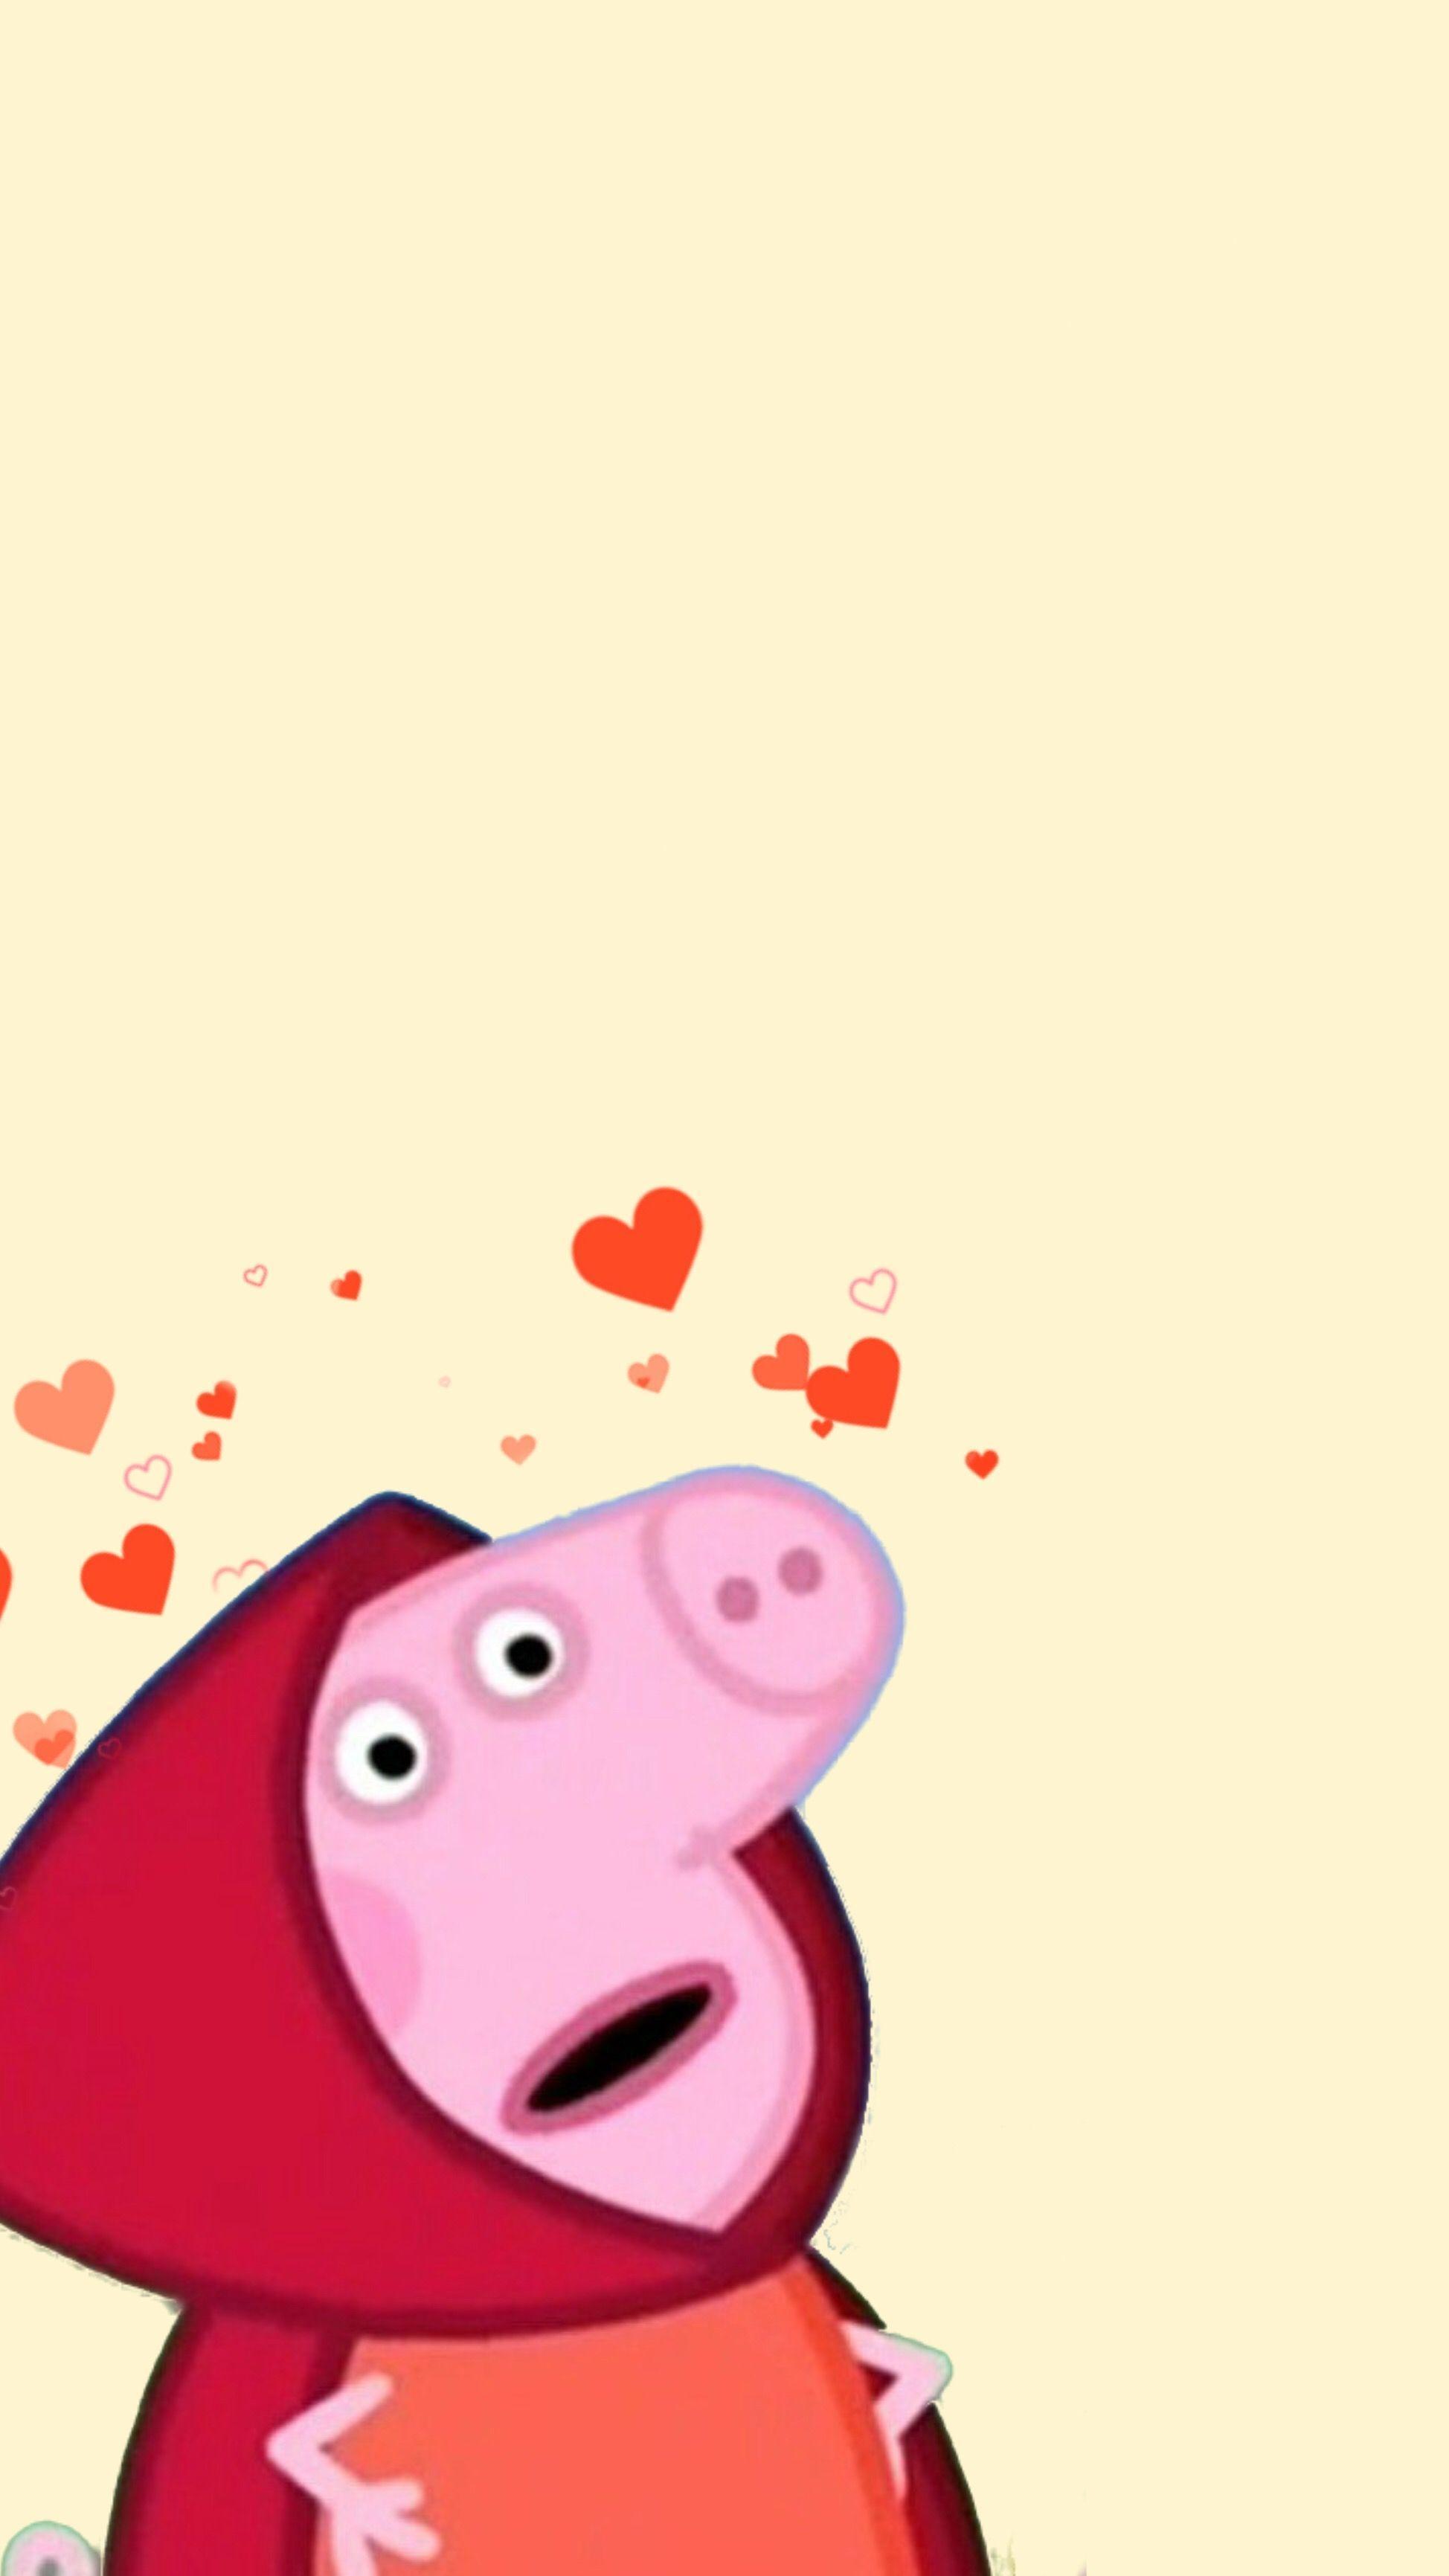 Peppa Pig Phone Wallpapers Wallpaper Cave